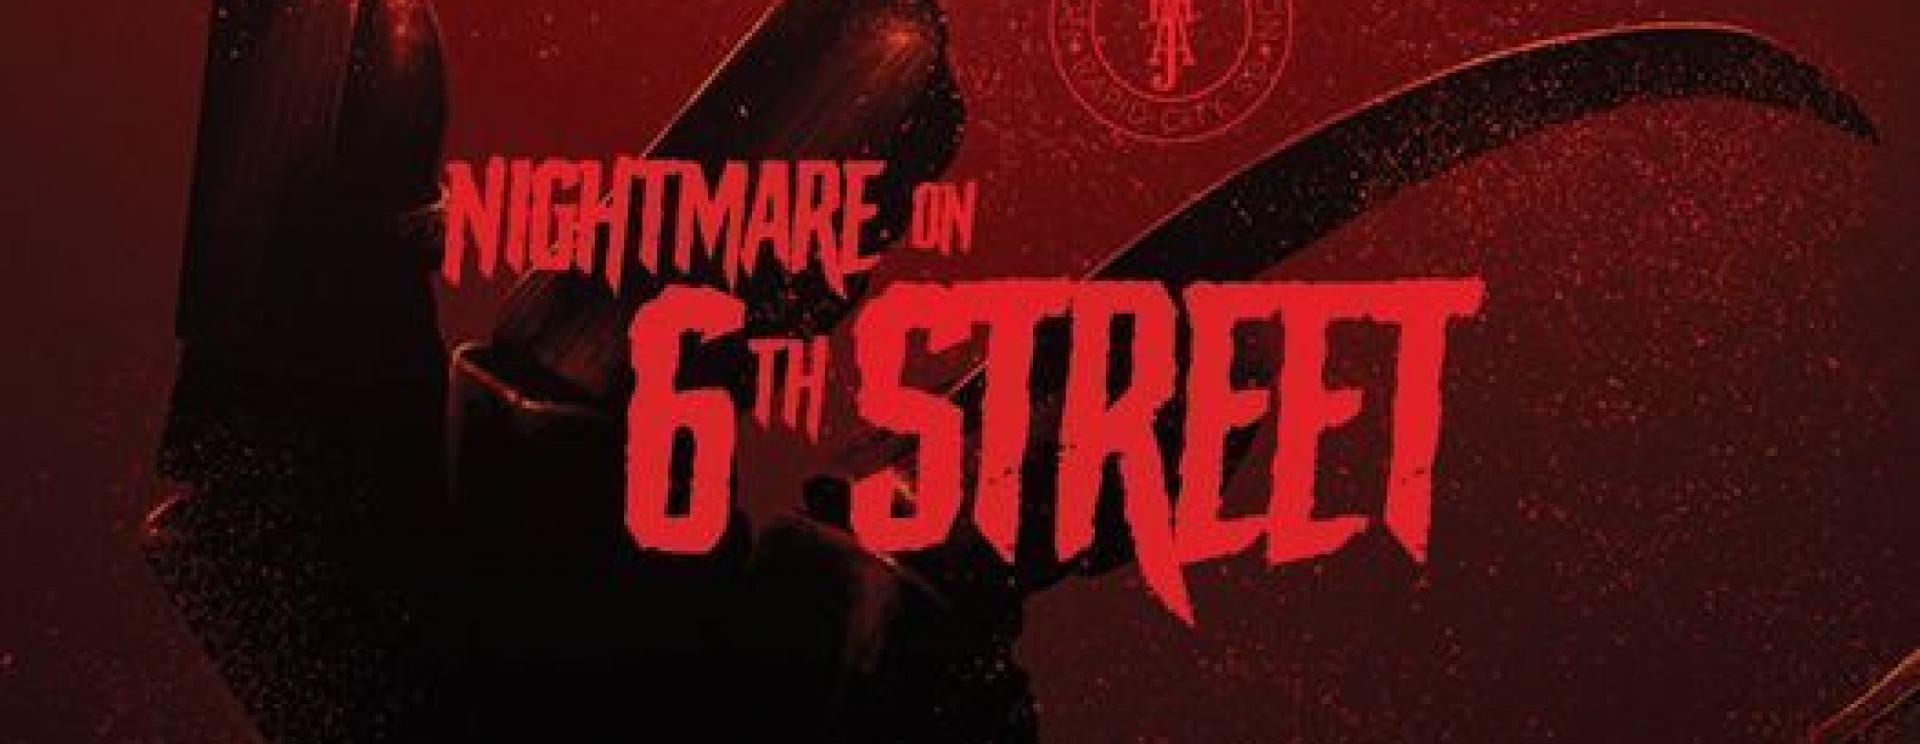 Nightmare on 6th Street